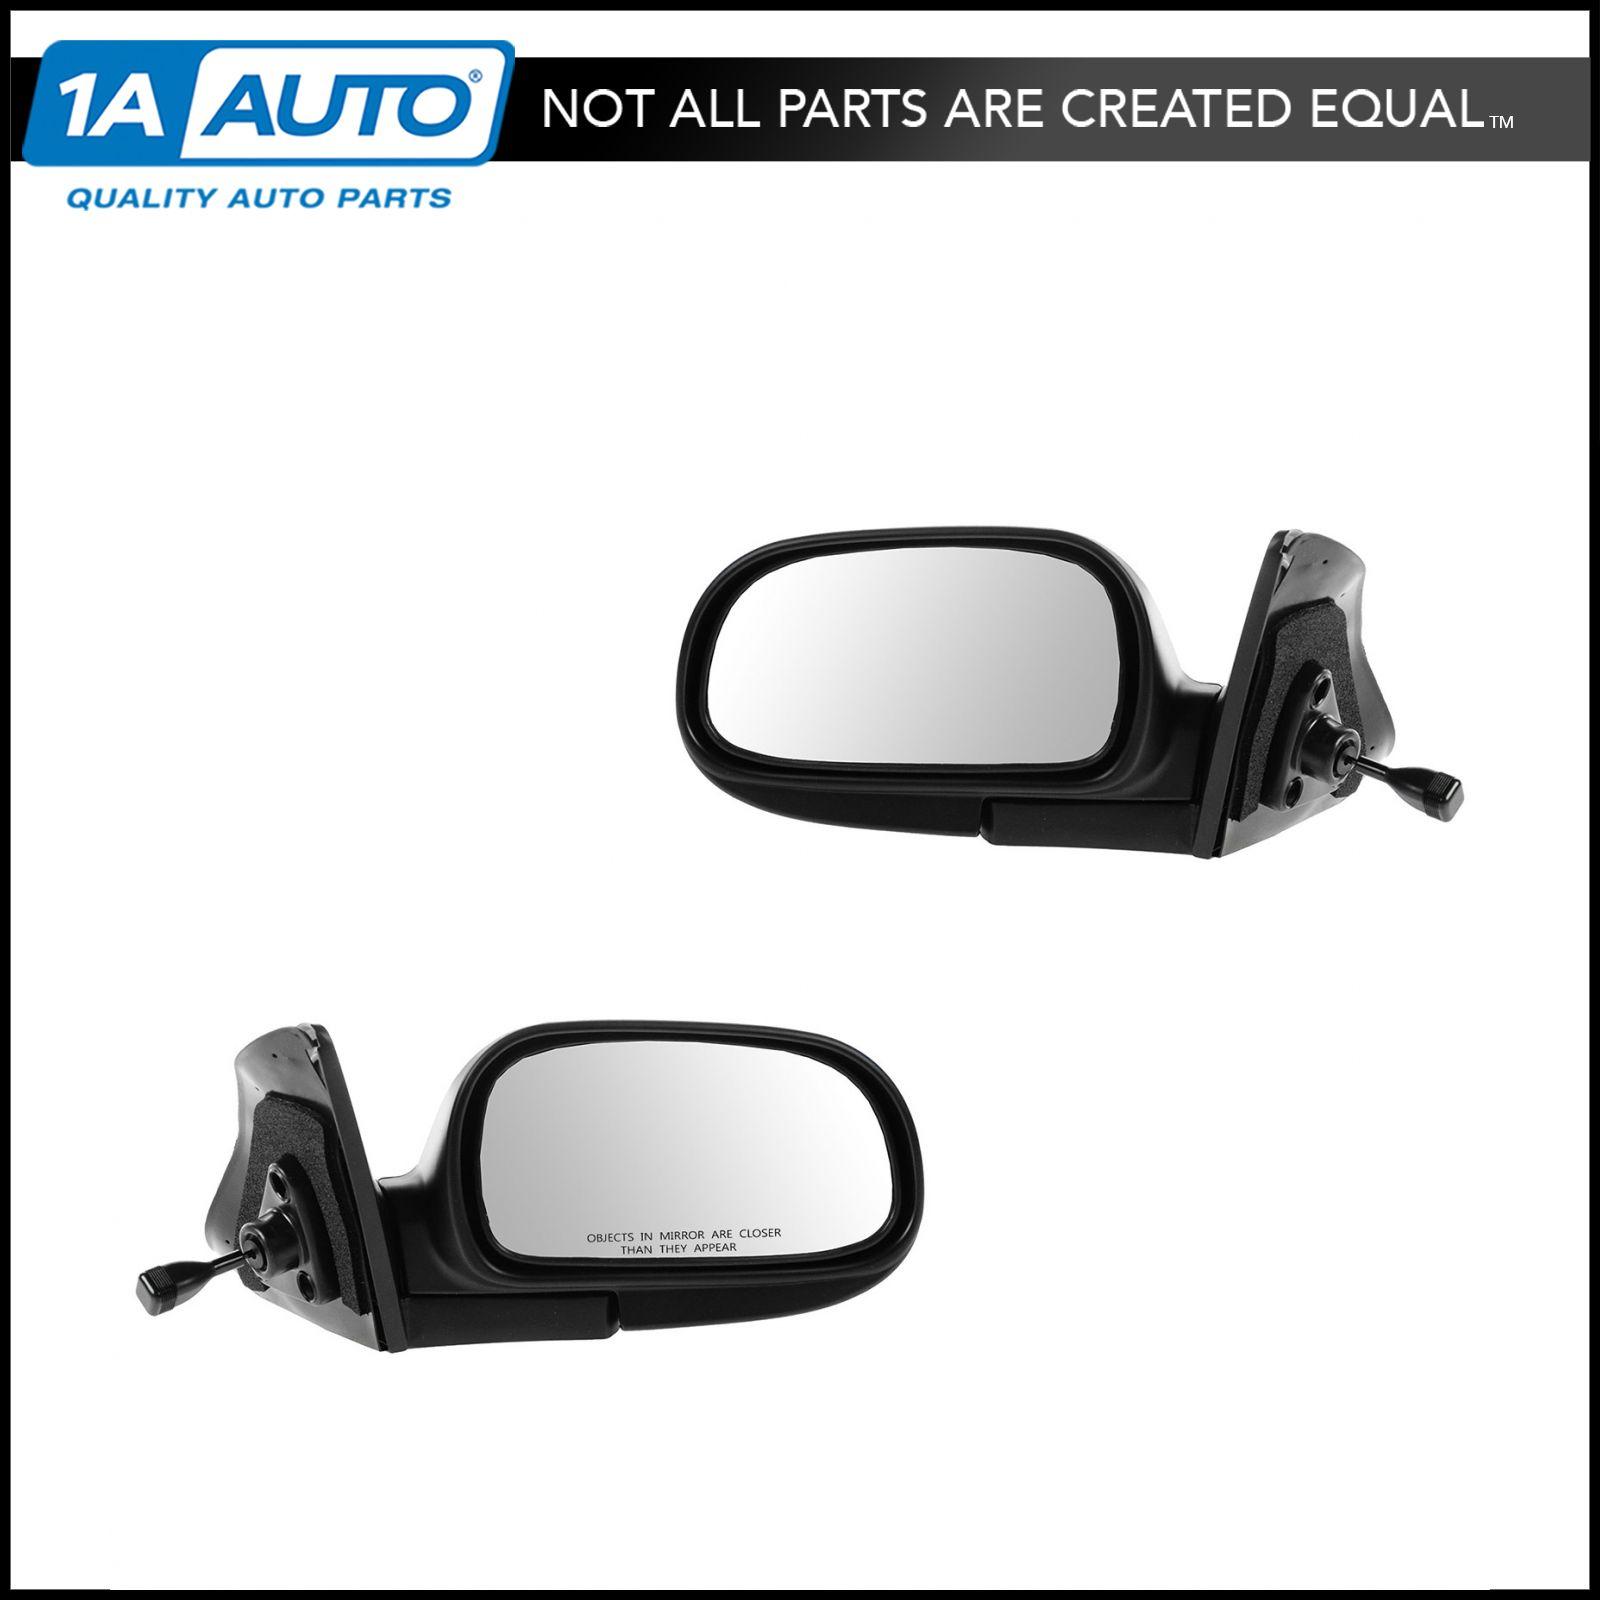 Mirrors Manual LH Driver /& RH Passenger Pair Set for 07-14 Toyota FJ Cruiser